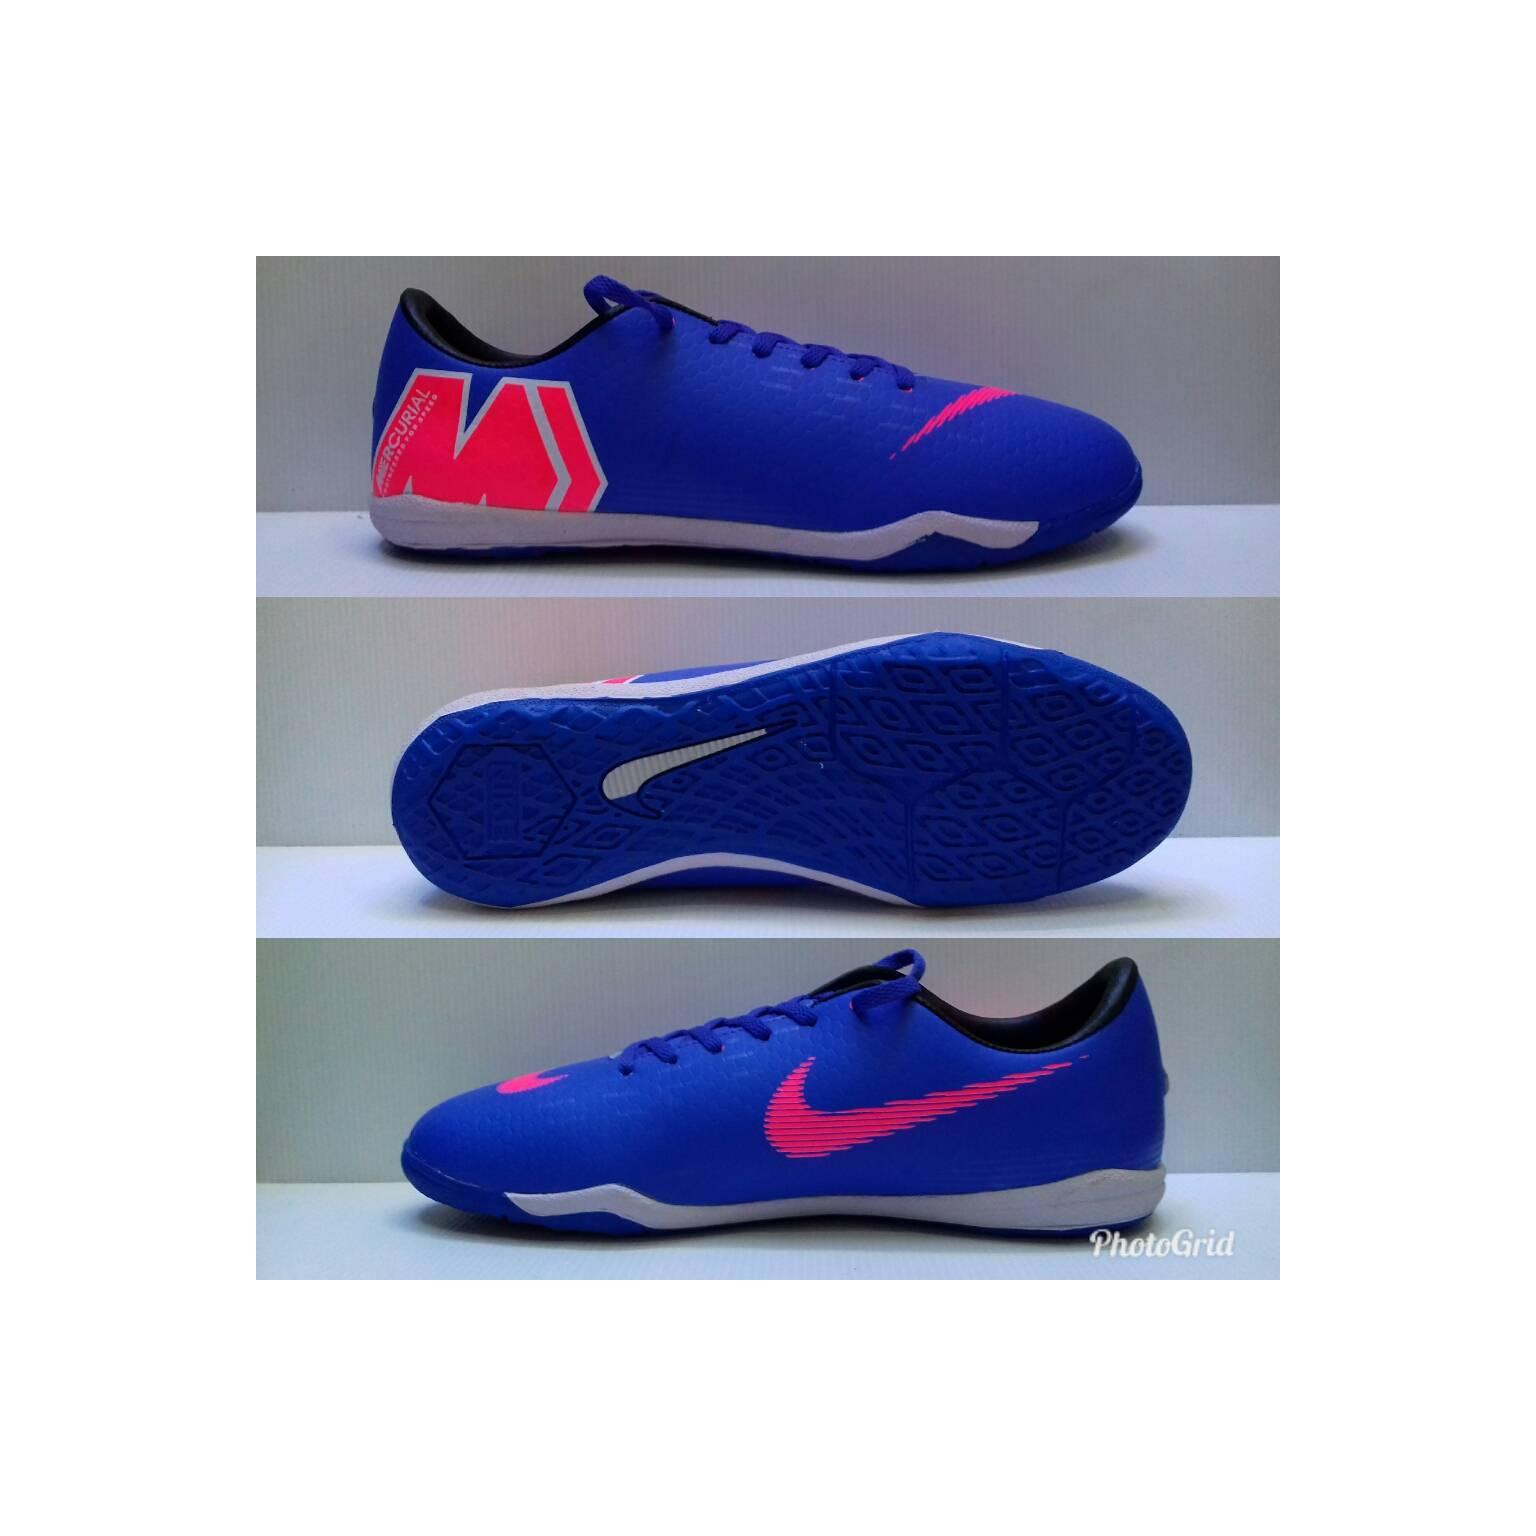 Sepatu futsal Nike mercurial biru list hitam sol karet